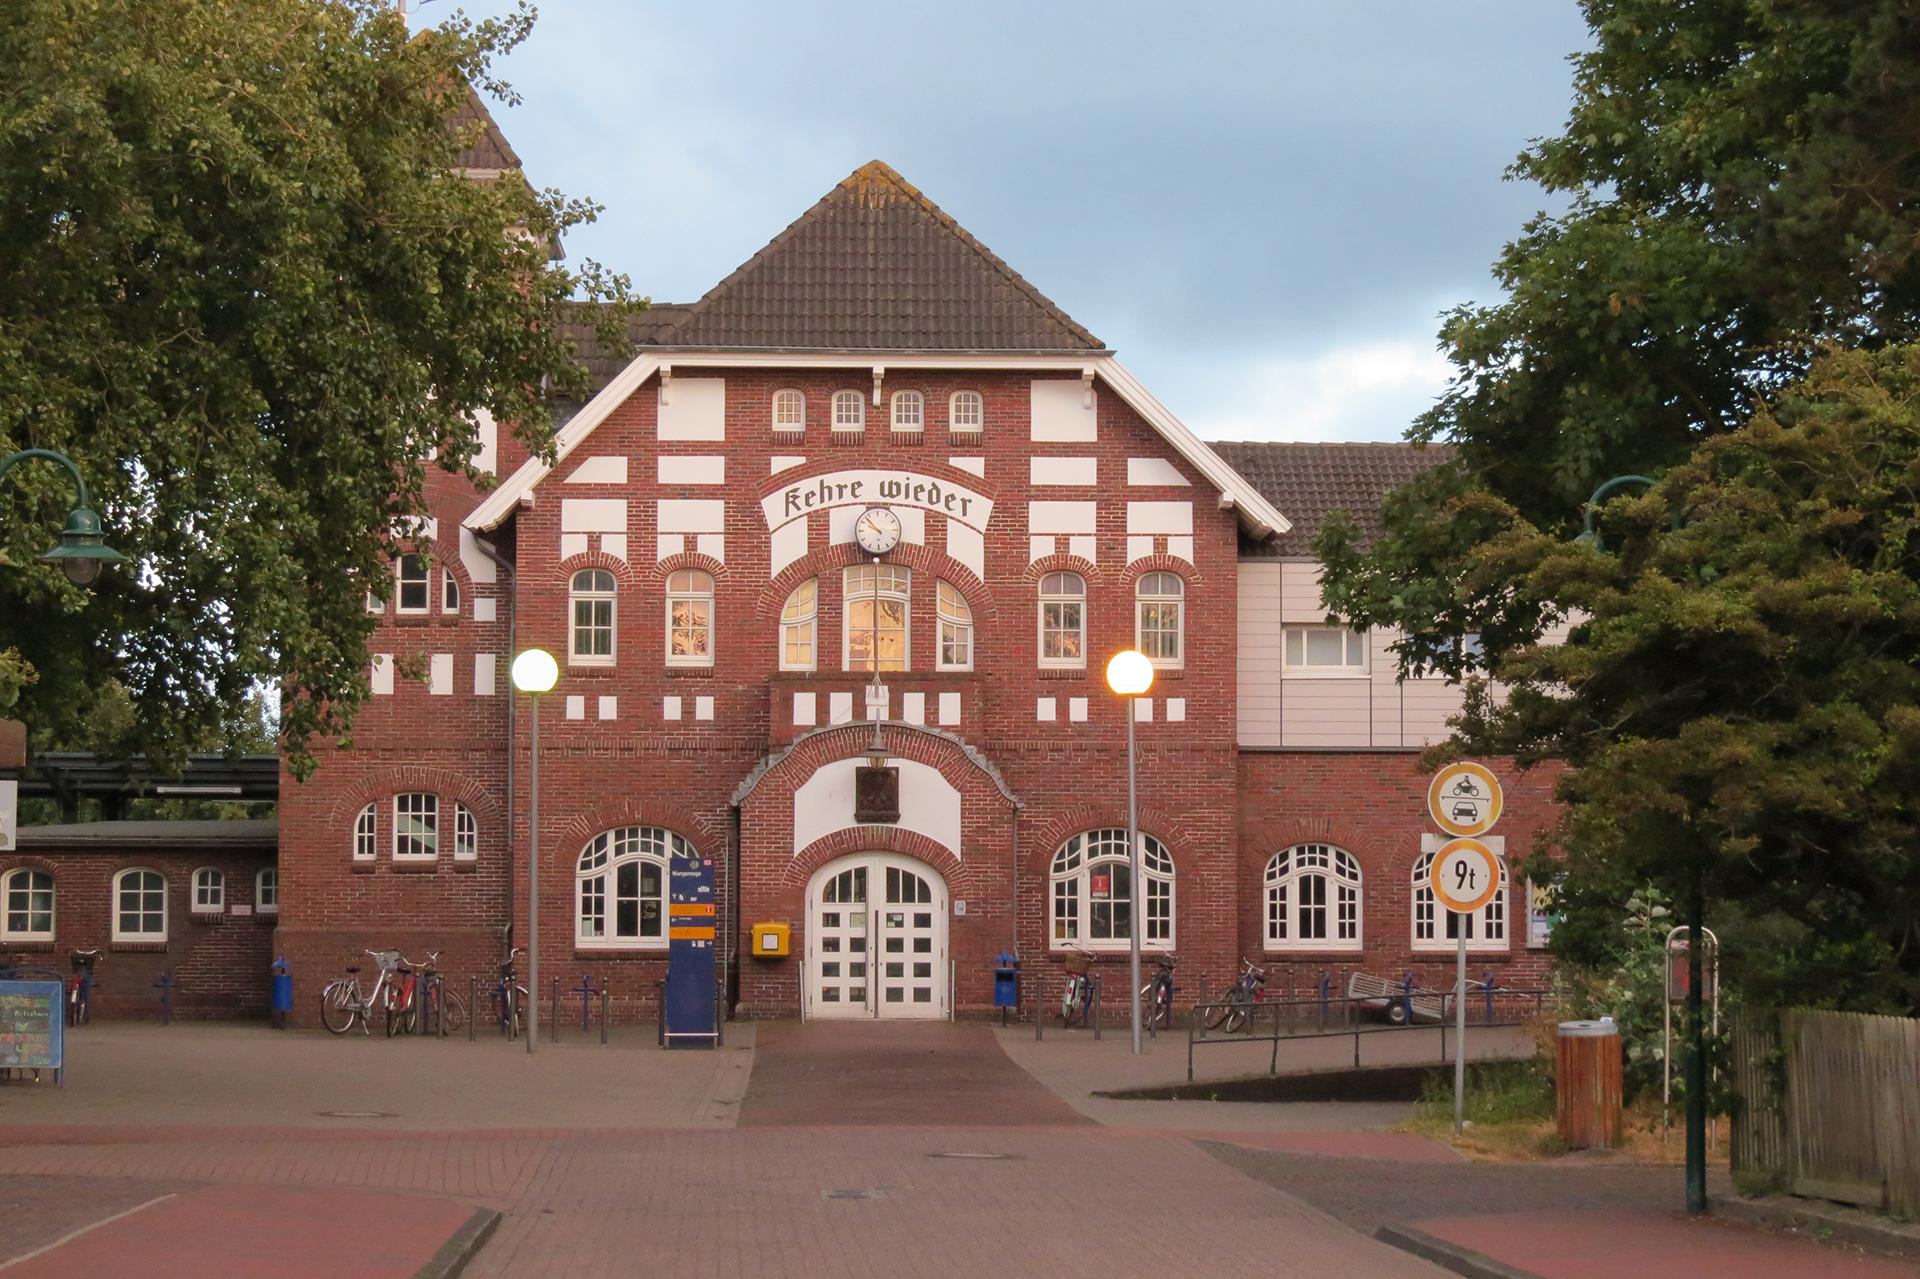 BahnhofWangerooge